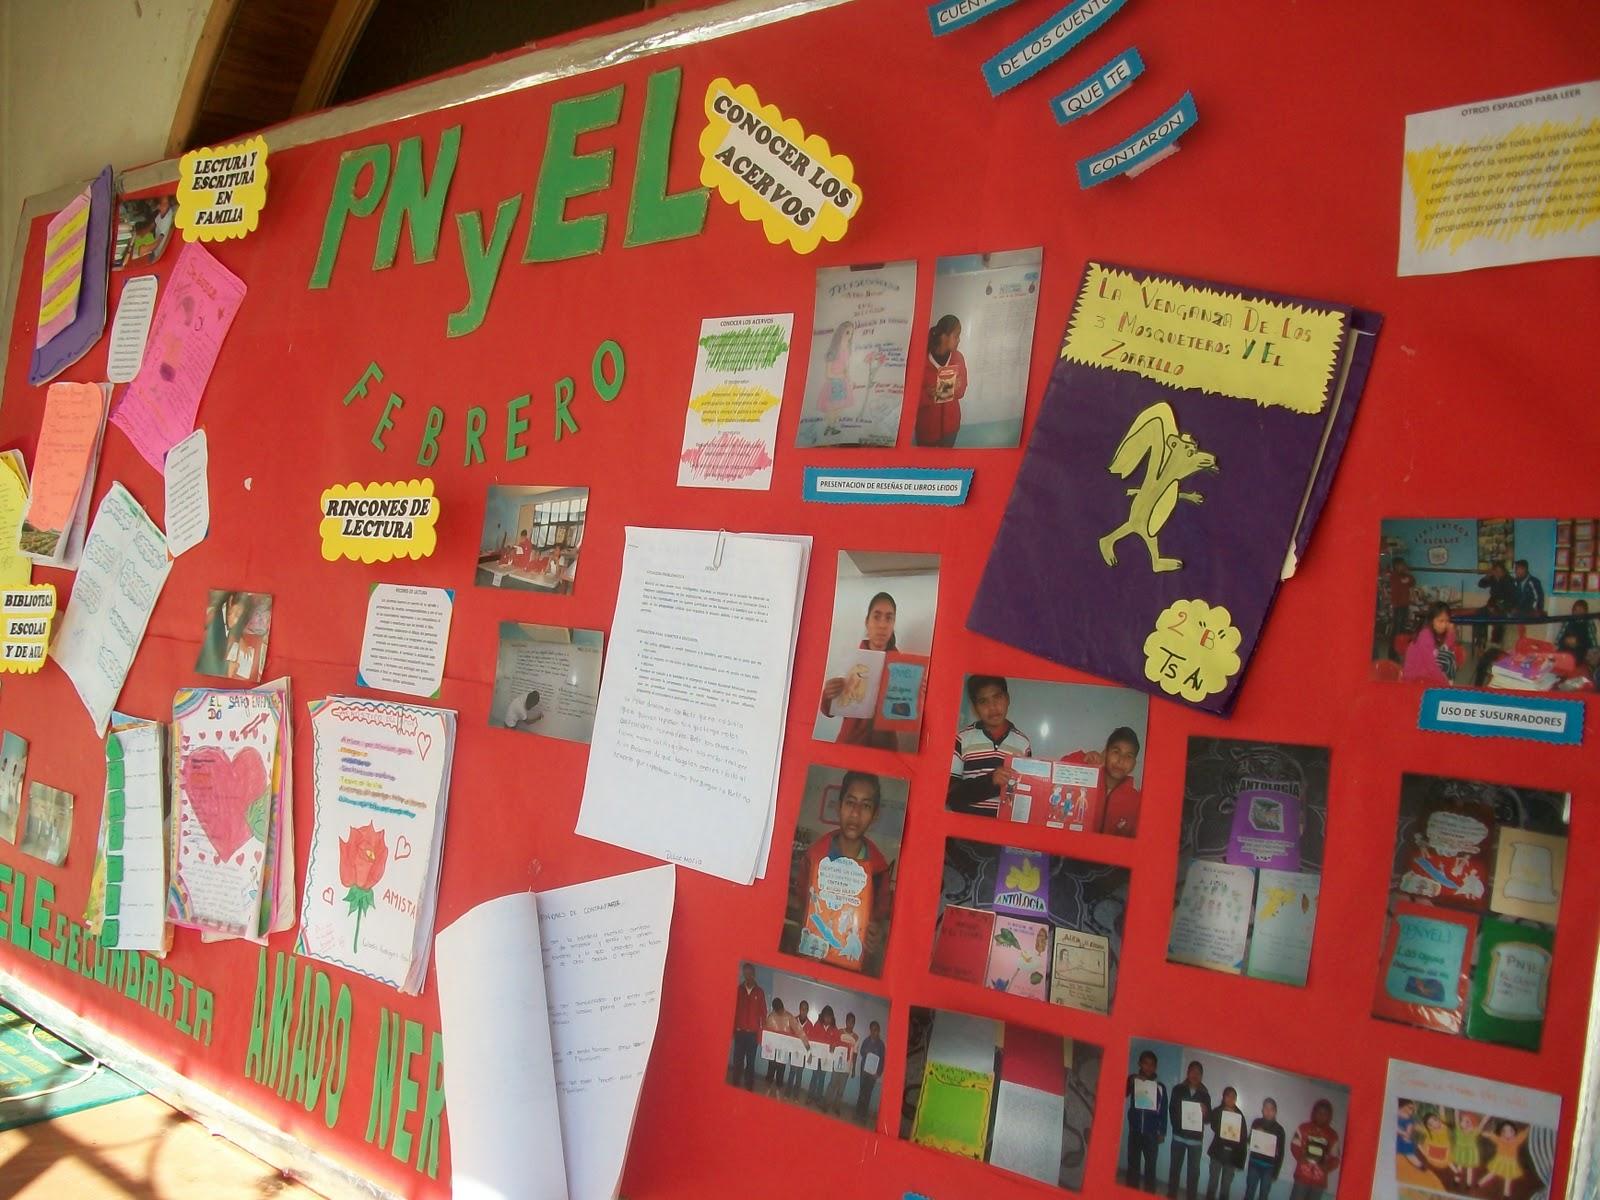 Supervisi n escolar zona 83 zongolica peri dico mural pnl for Componentes de un periodico mural